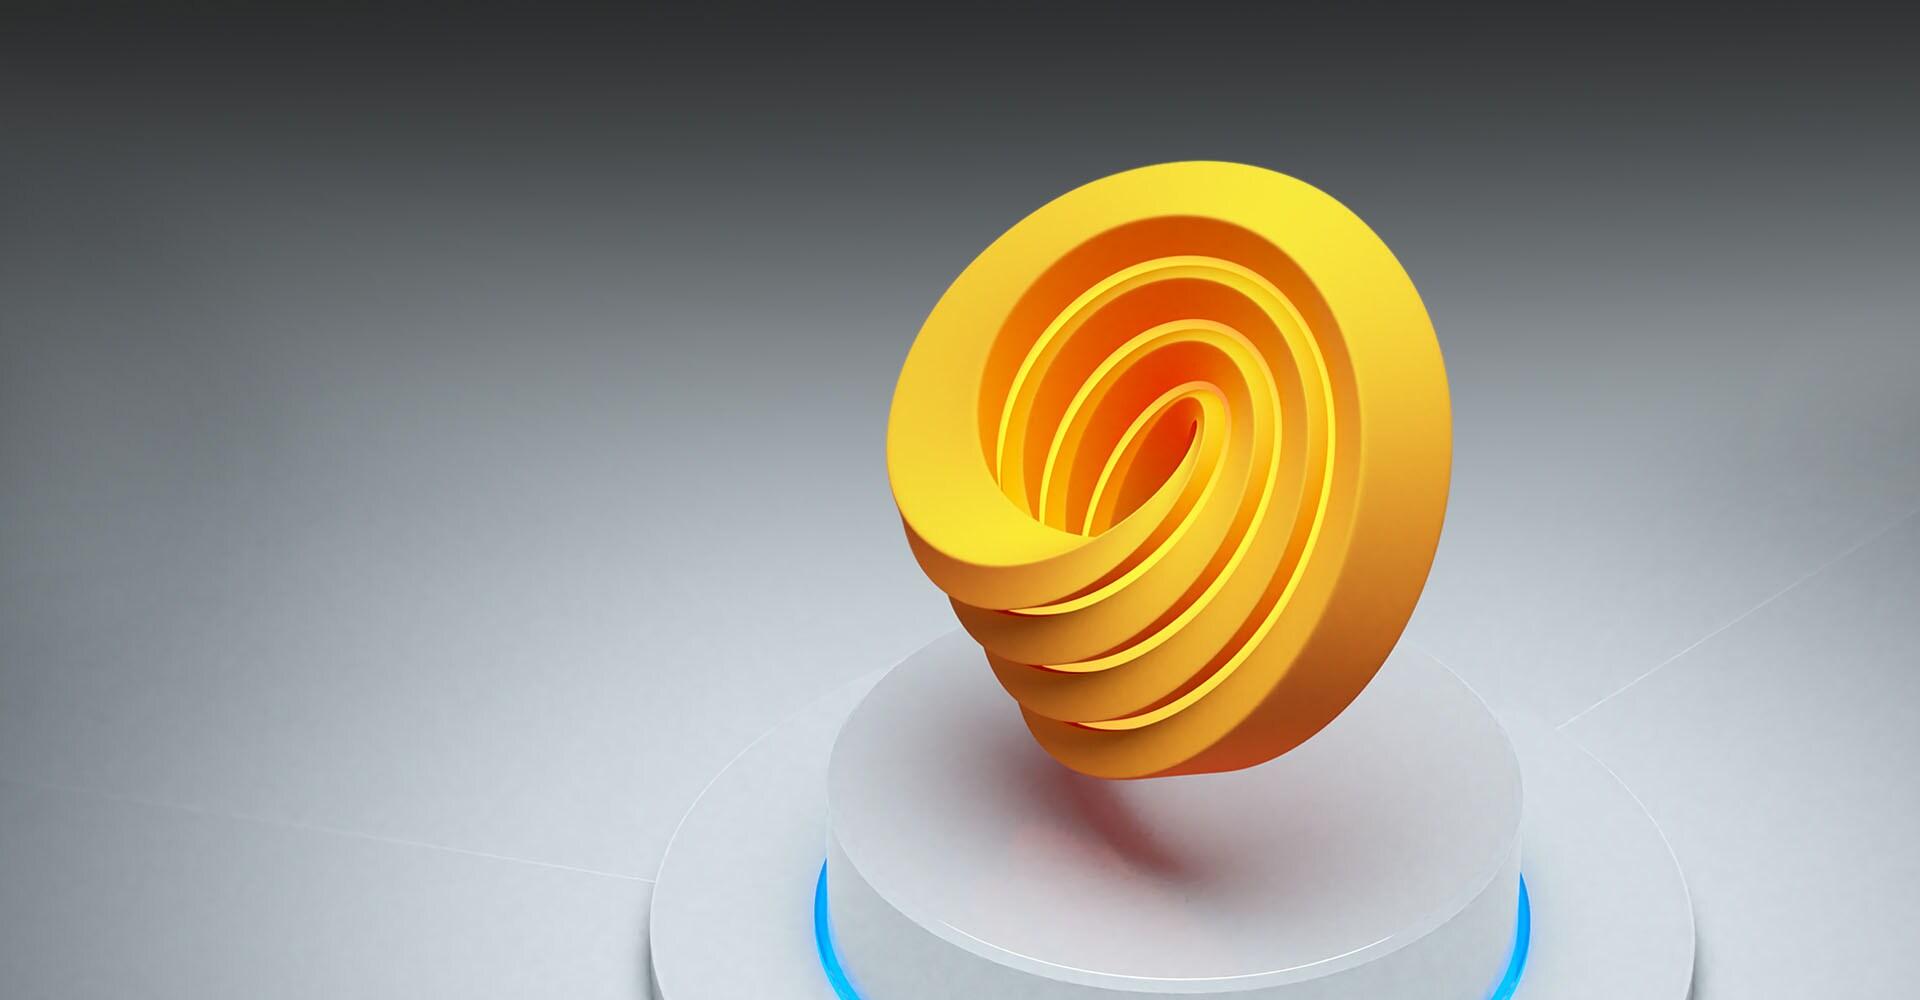 Autodesk Forge Development Platform logo in 3D